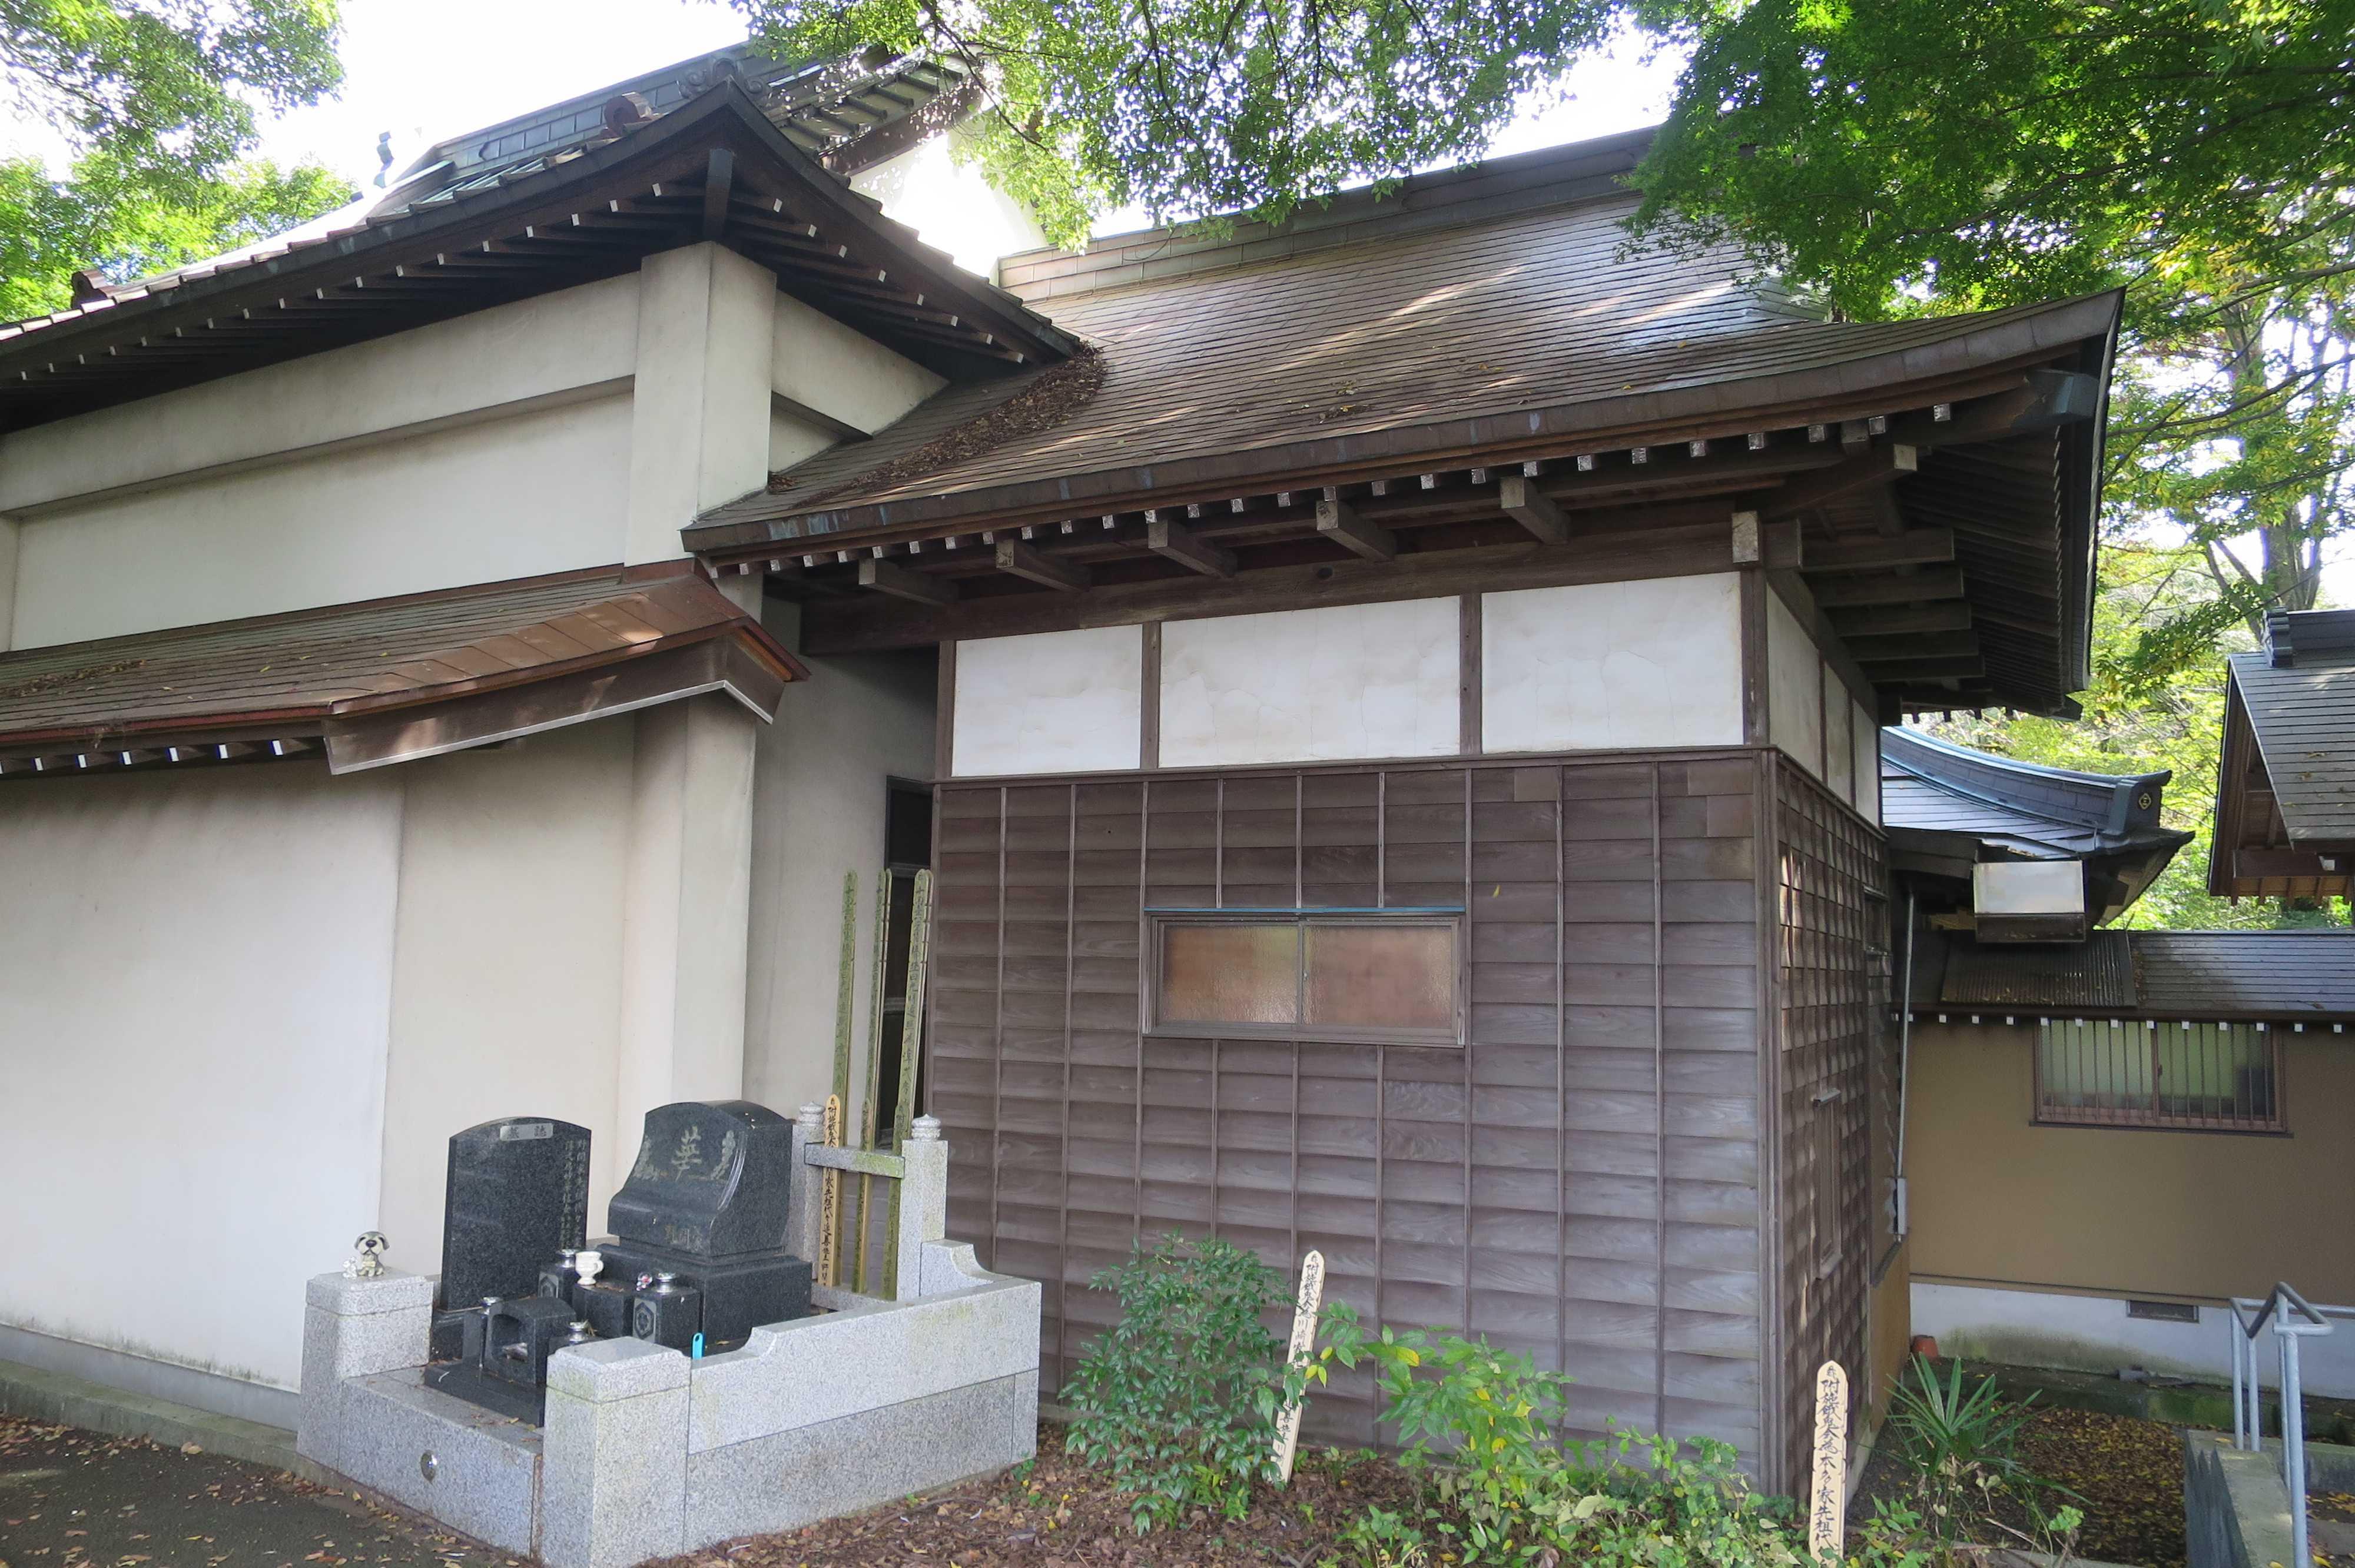 無量光寺 - 本堂の裏側